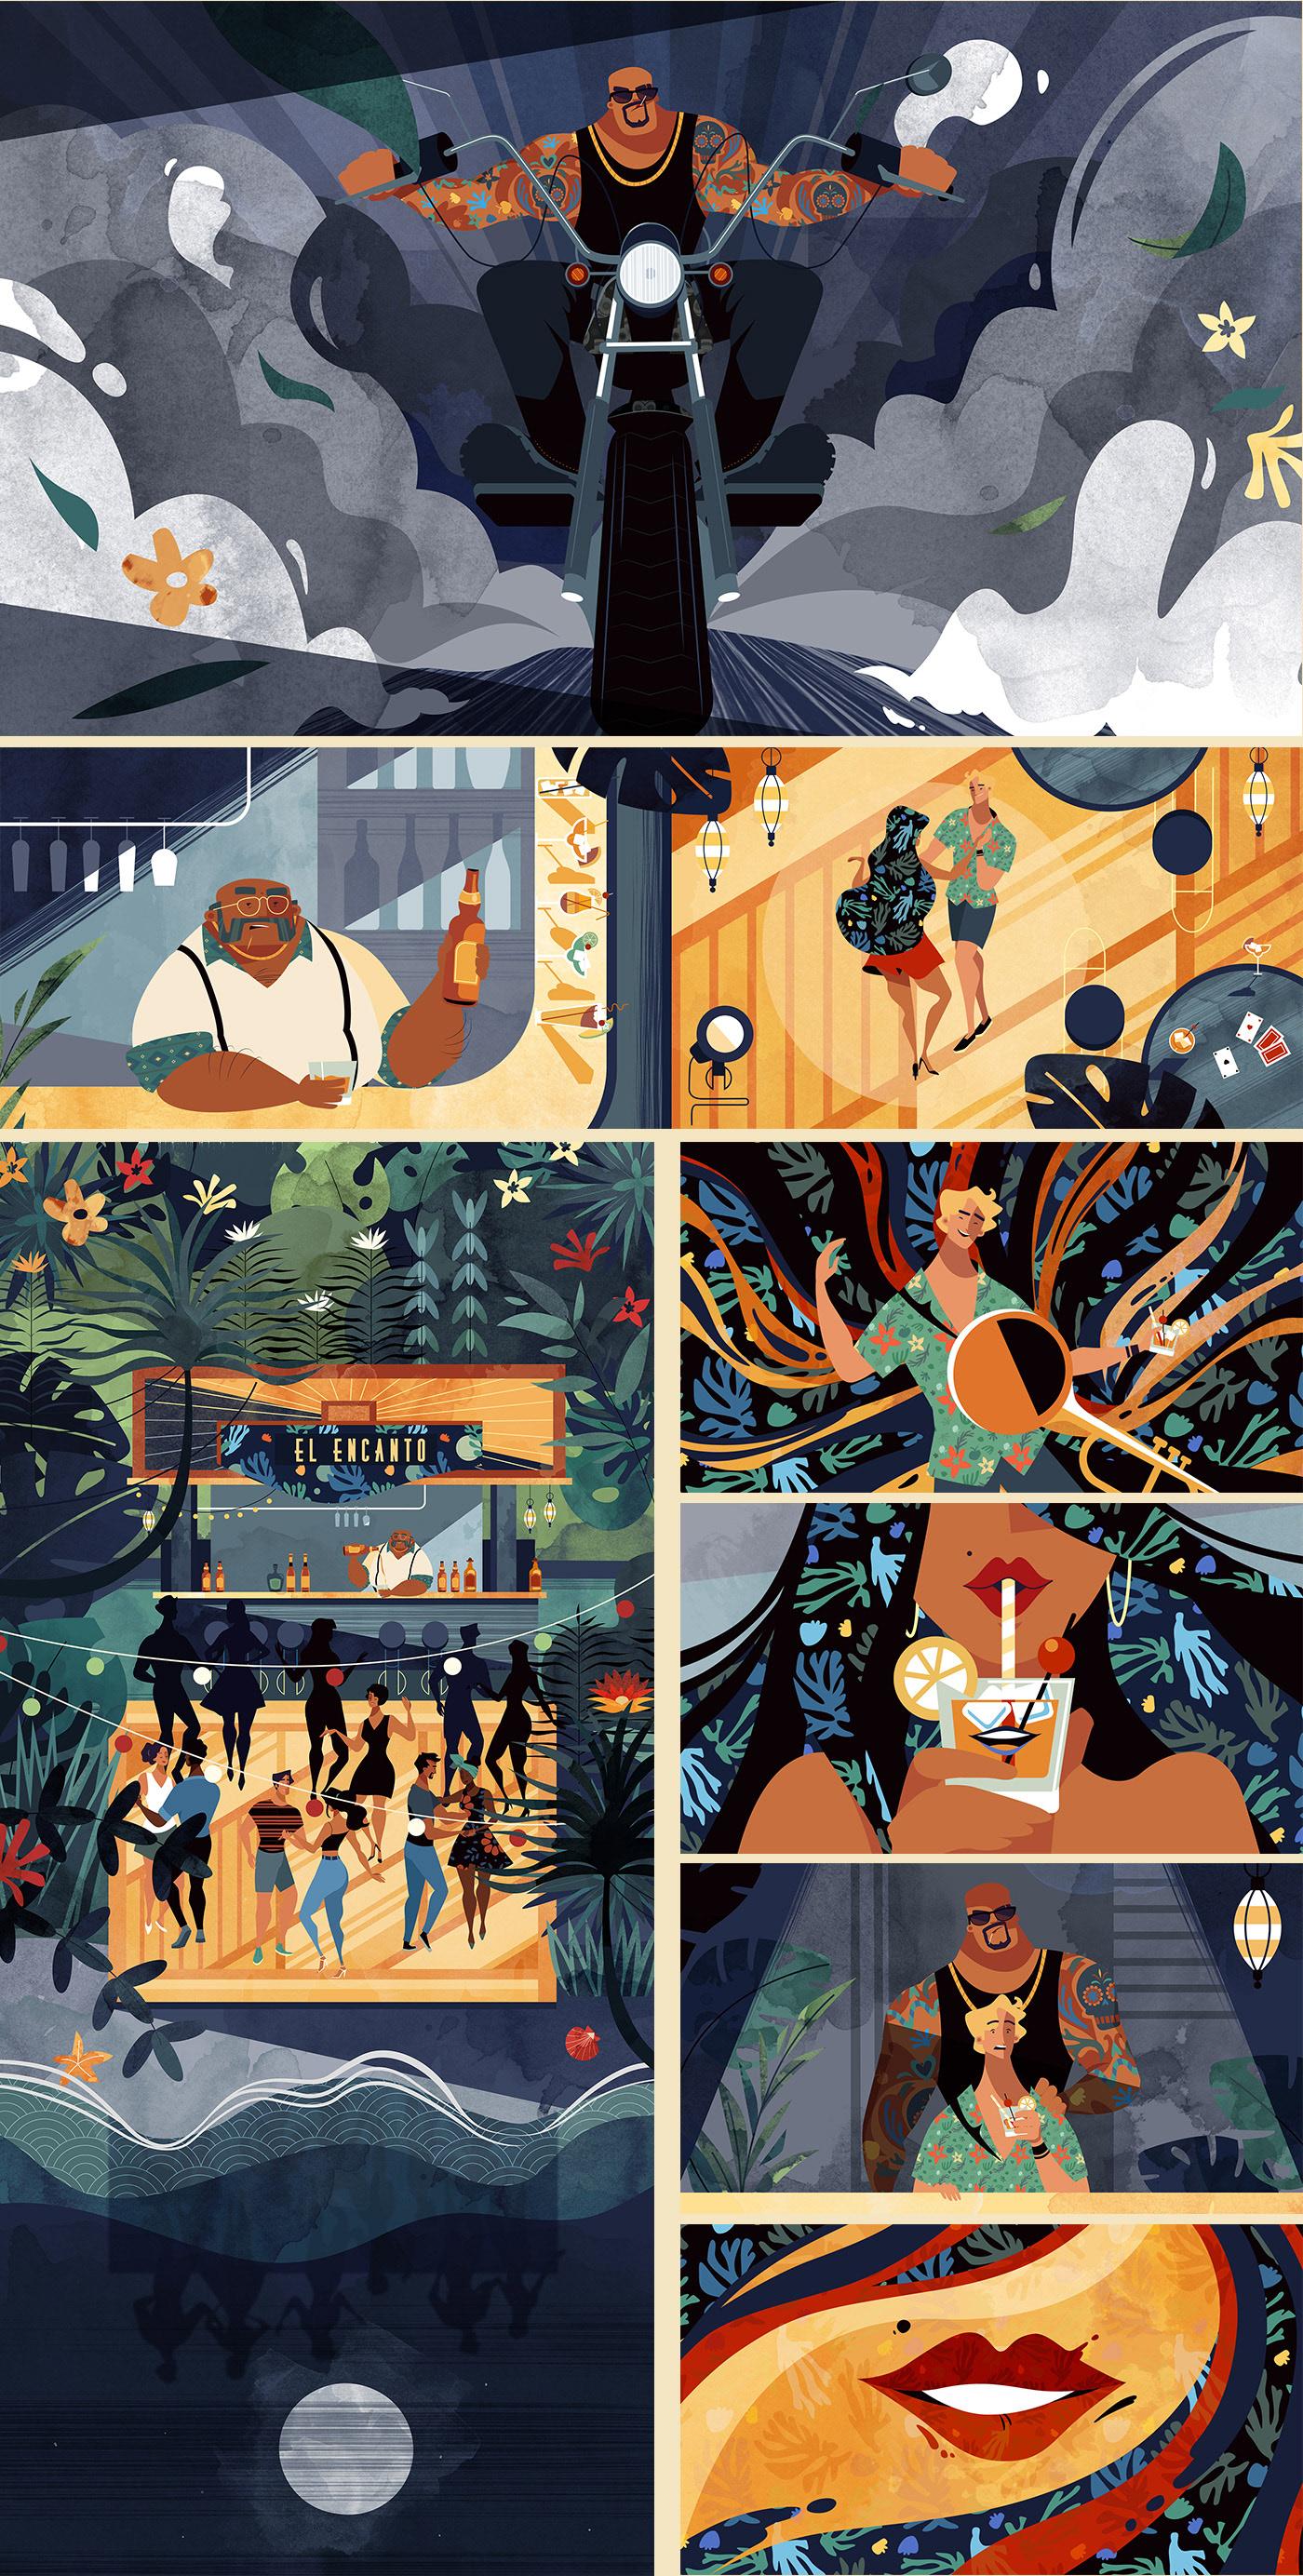 animation  DANCE   ILLUSTRATION  music video textures art direction  Cel Animation direction Nature storytelling